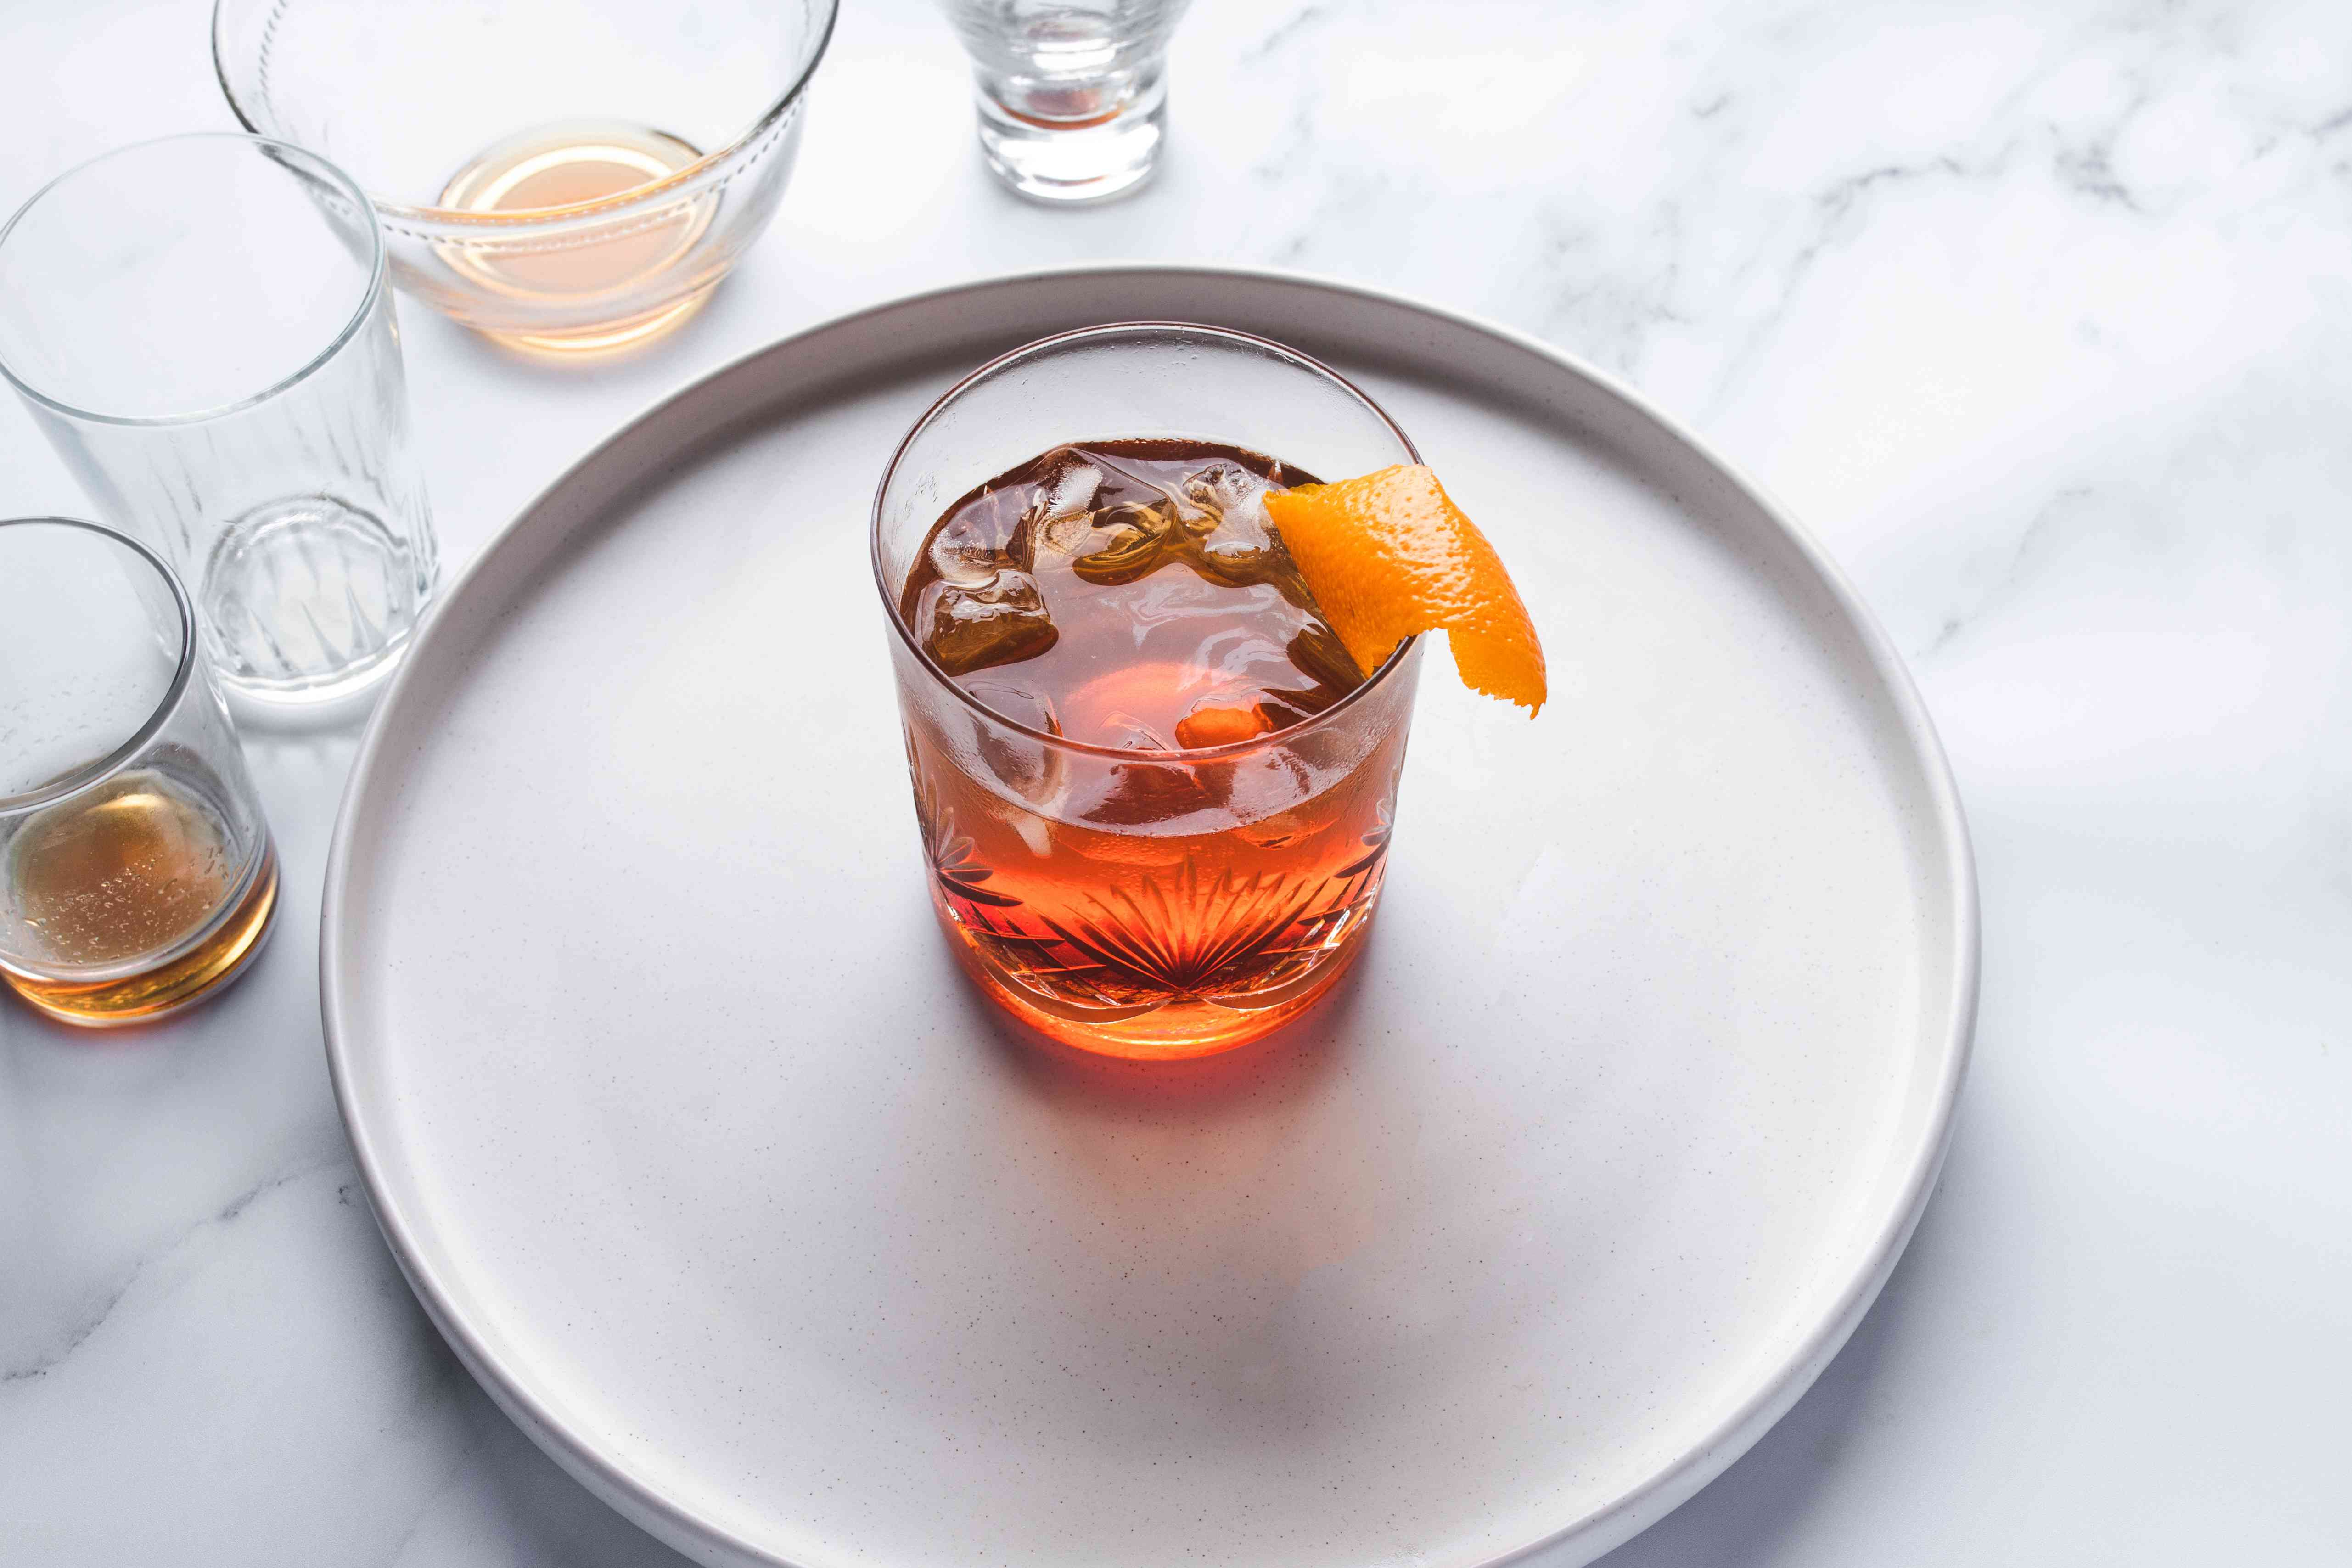 Garnish with an orange peel